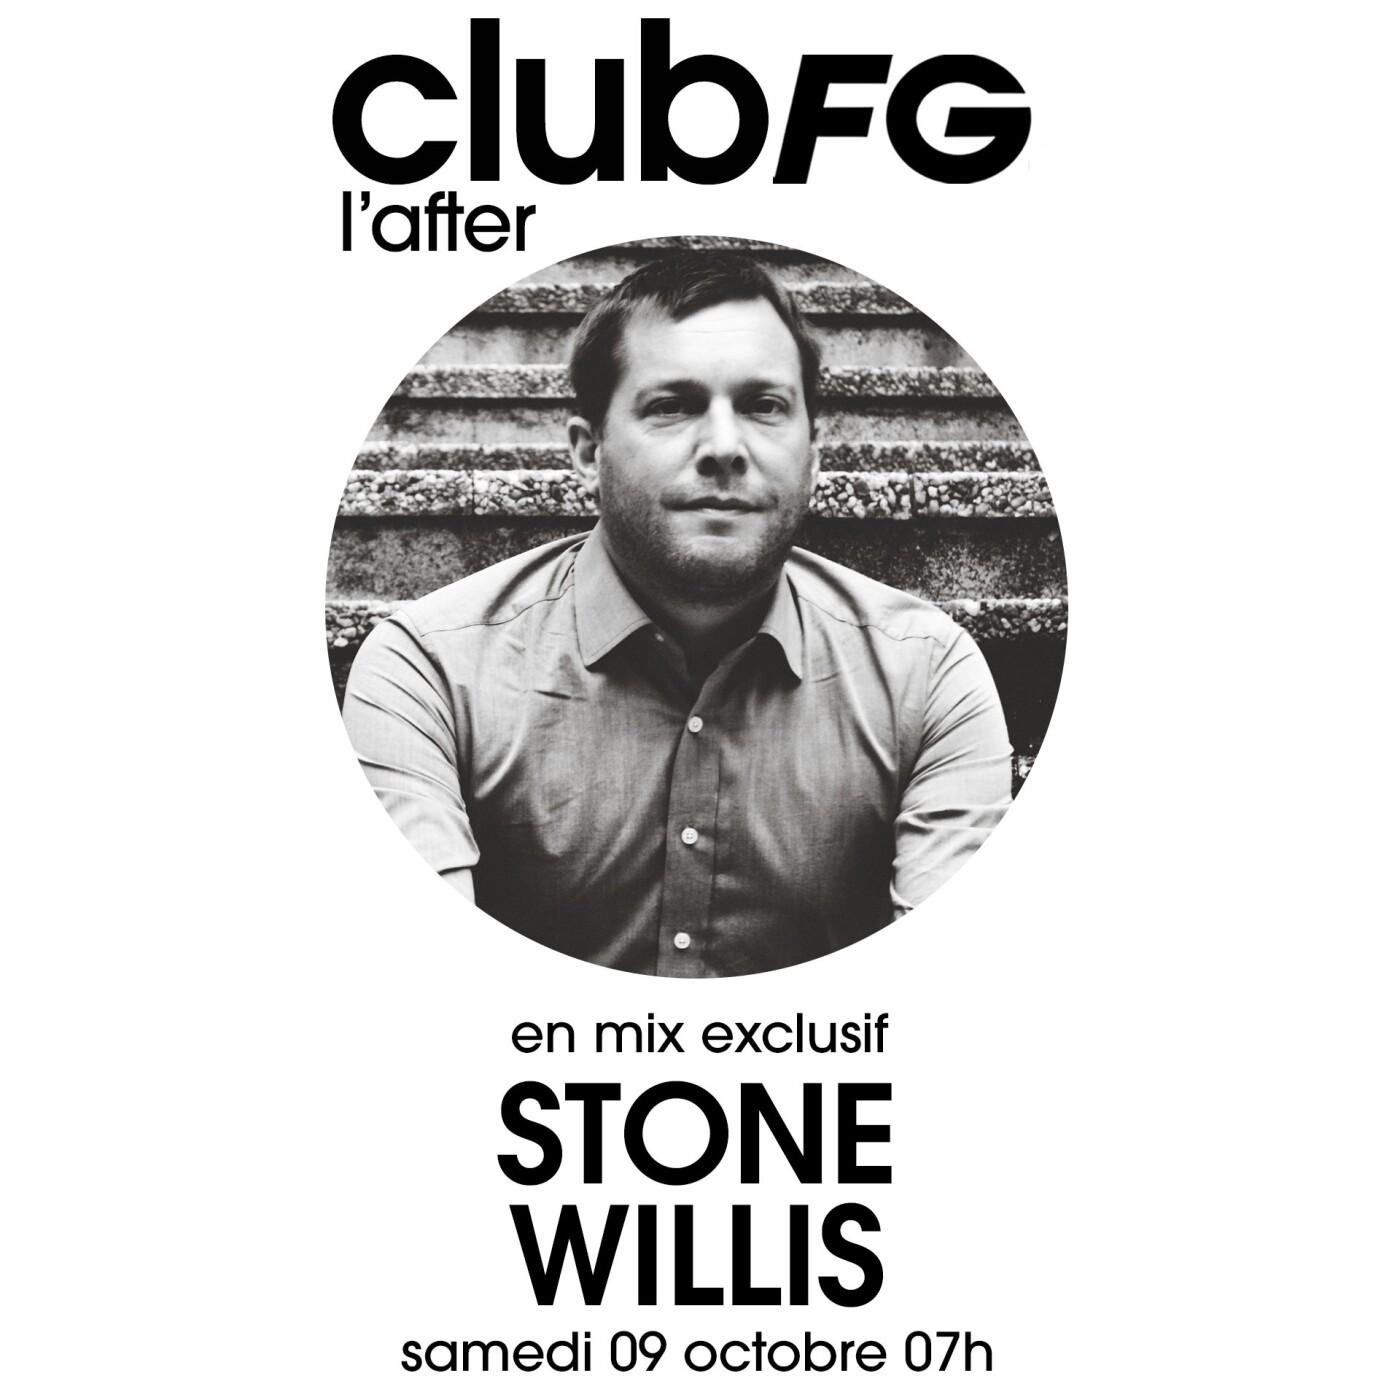 CLUB FG : STONE WILLIS